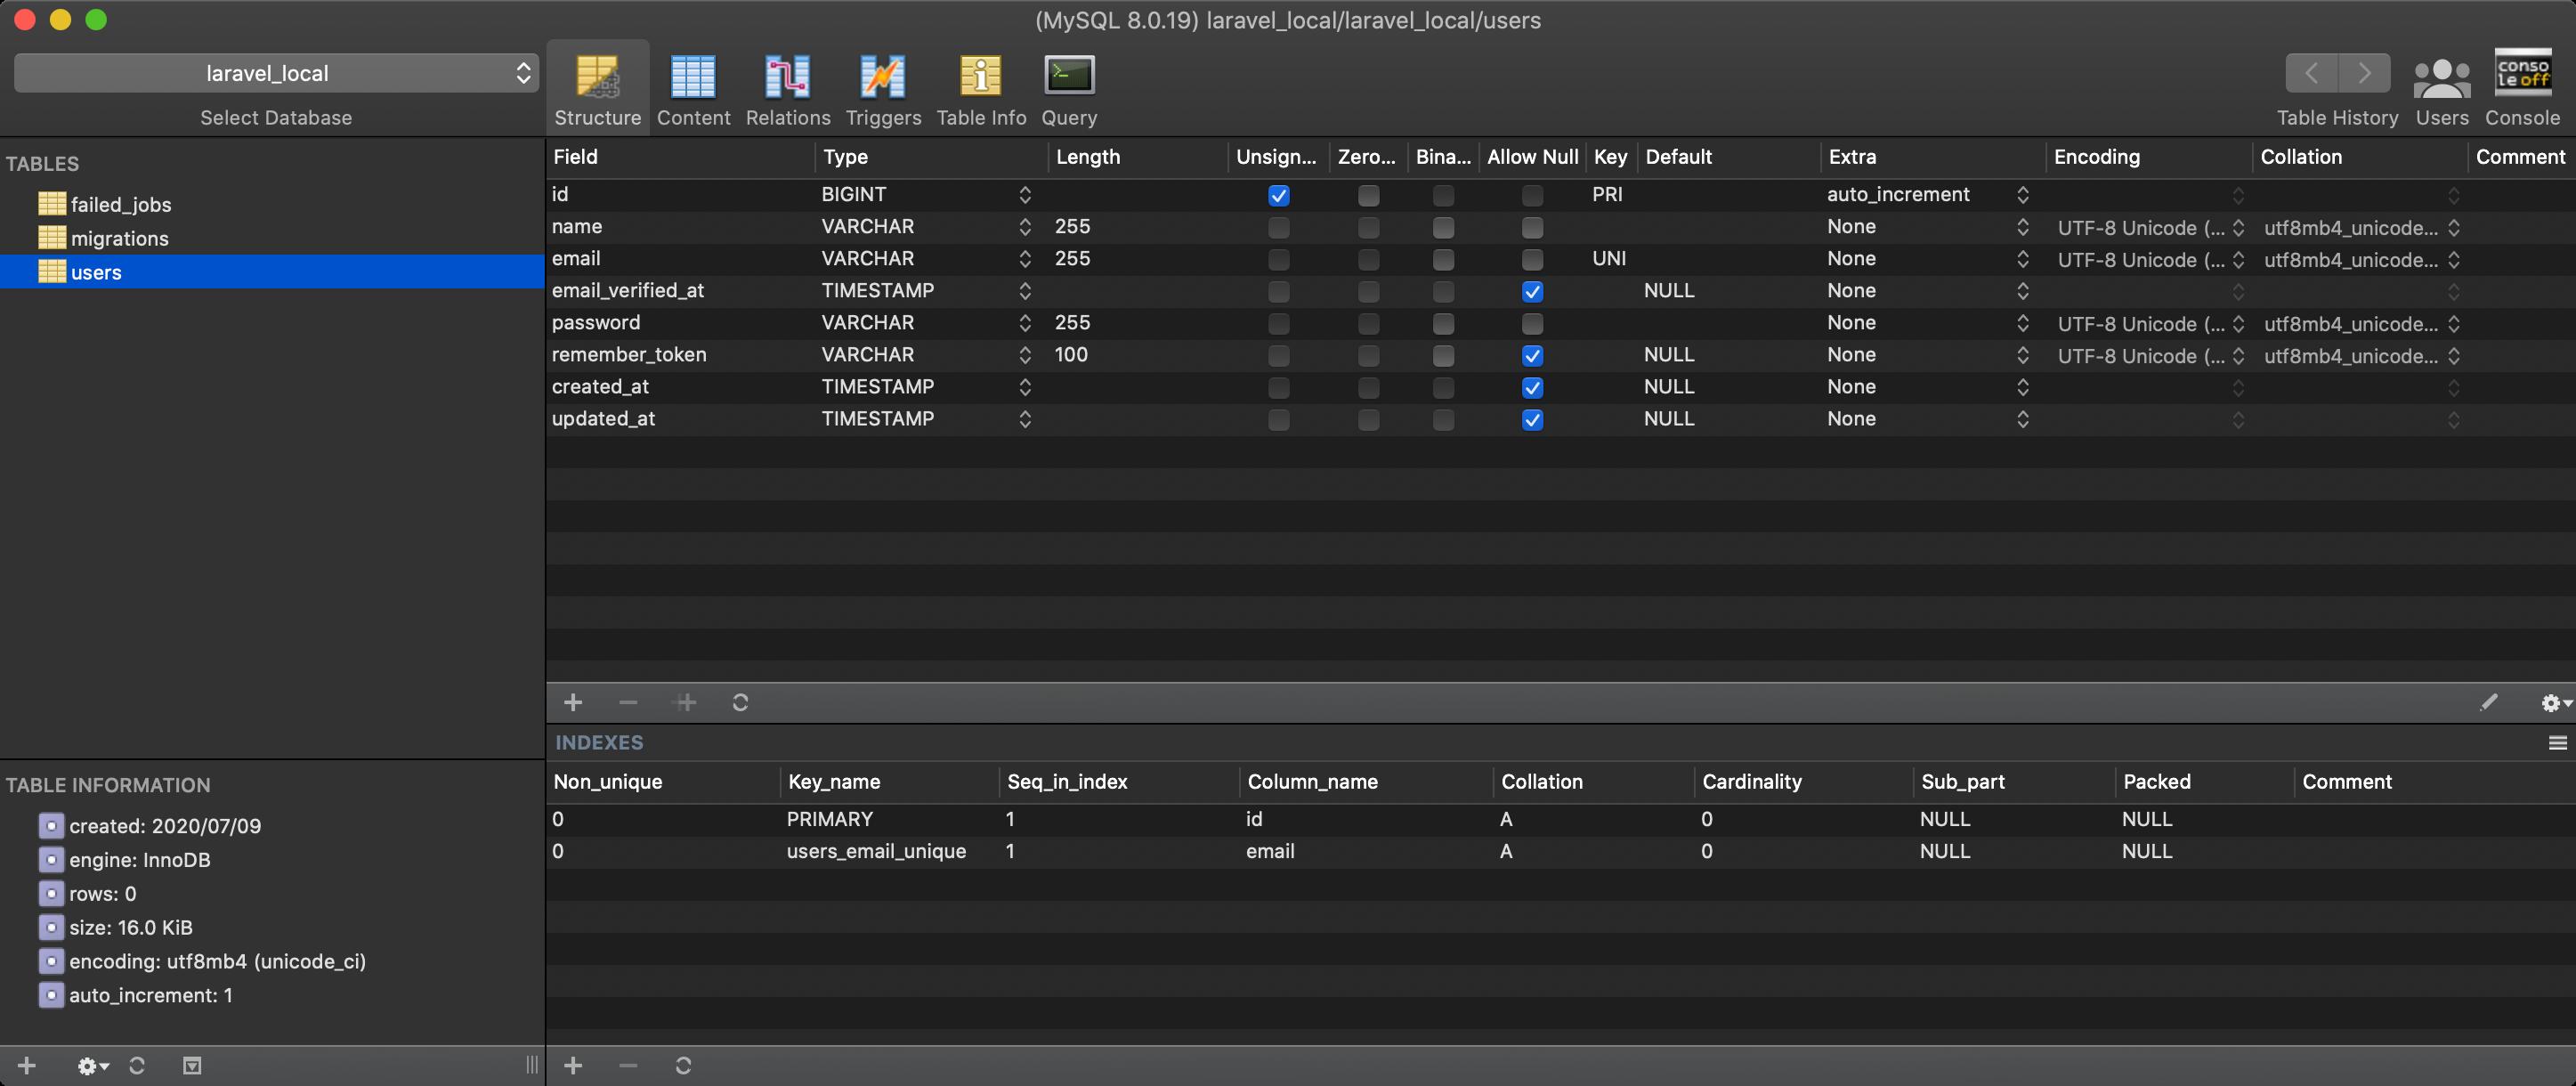 ScreenShot 2020-07-09 11.53.58.png